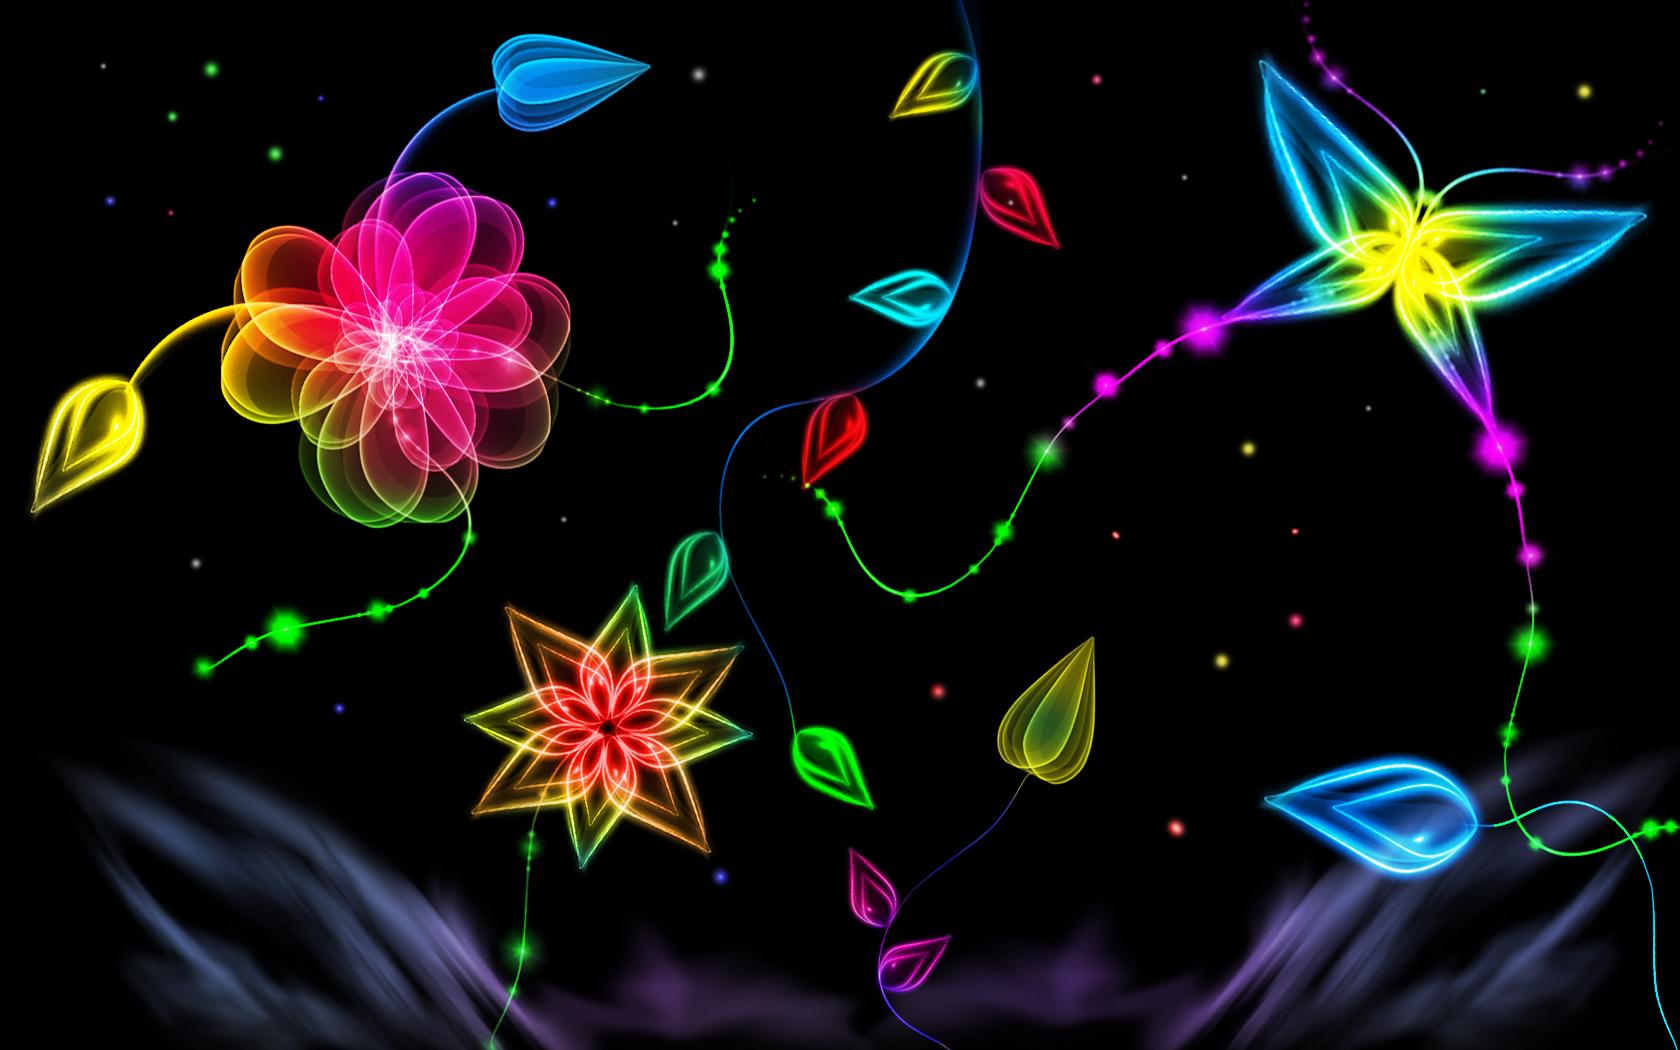 neon wallpaper A10